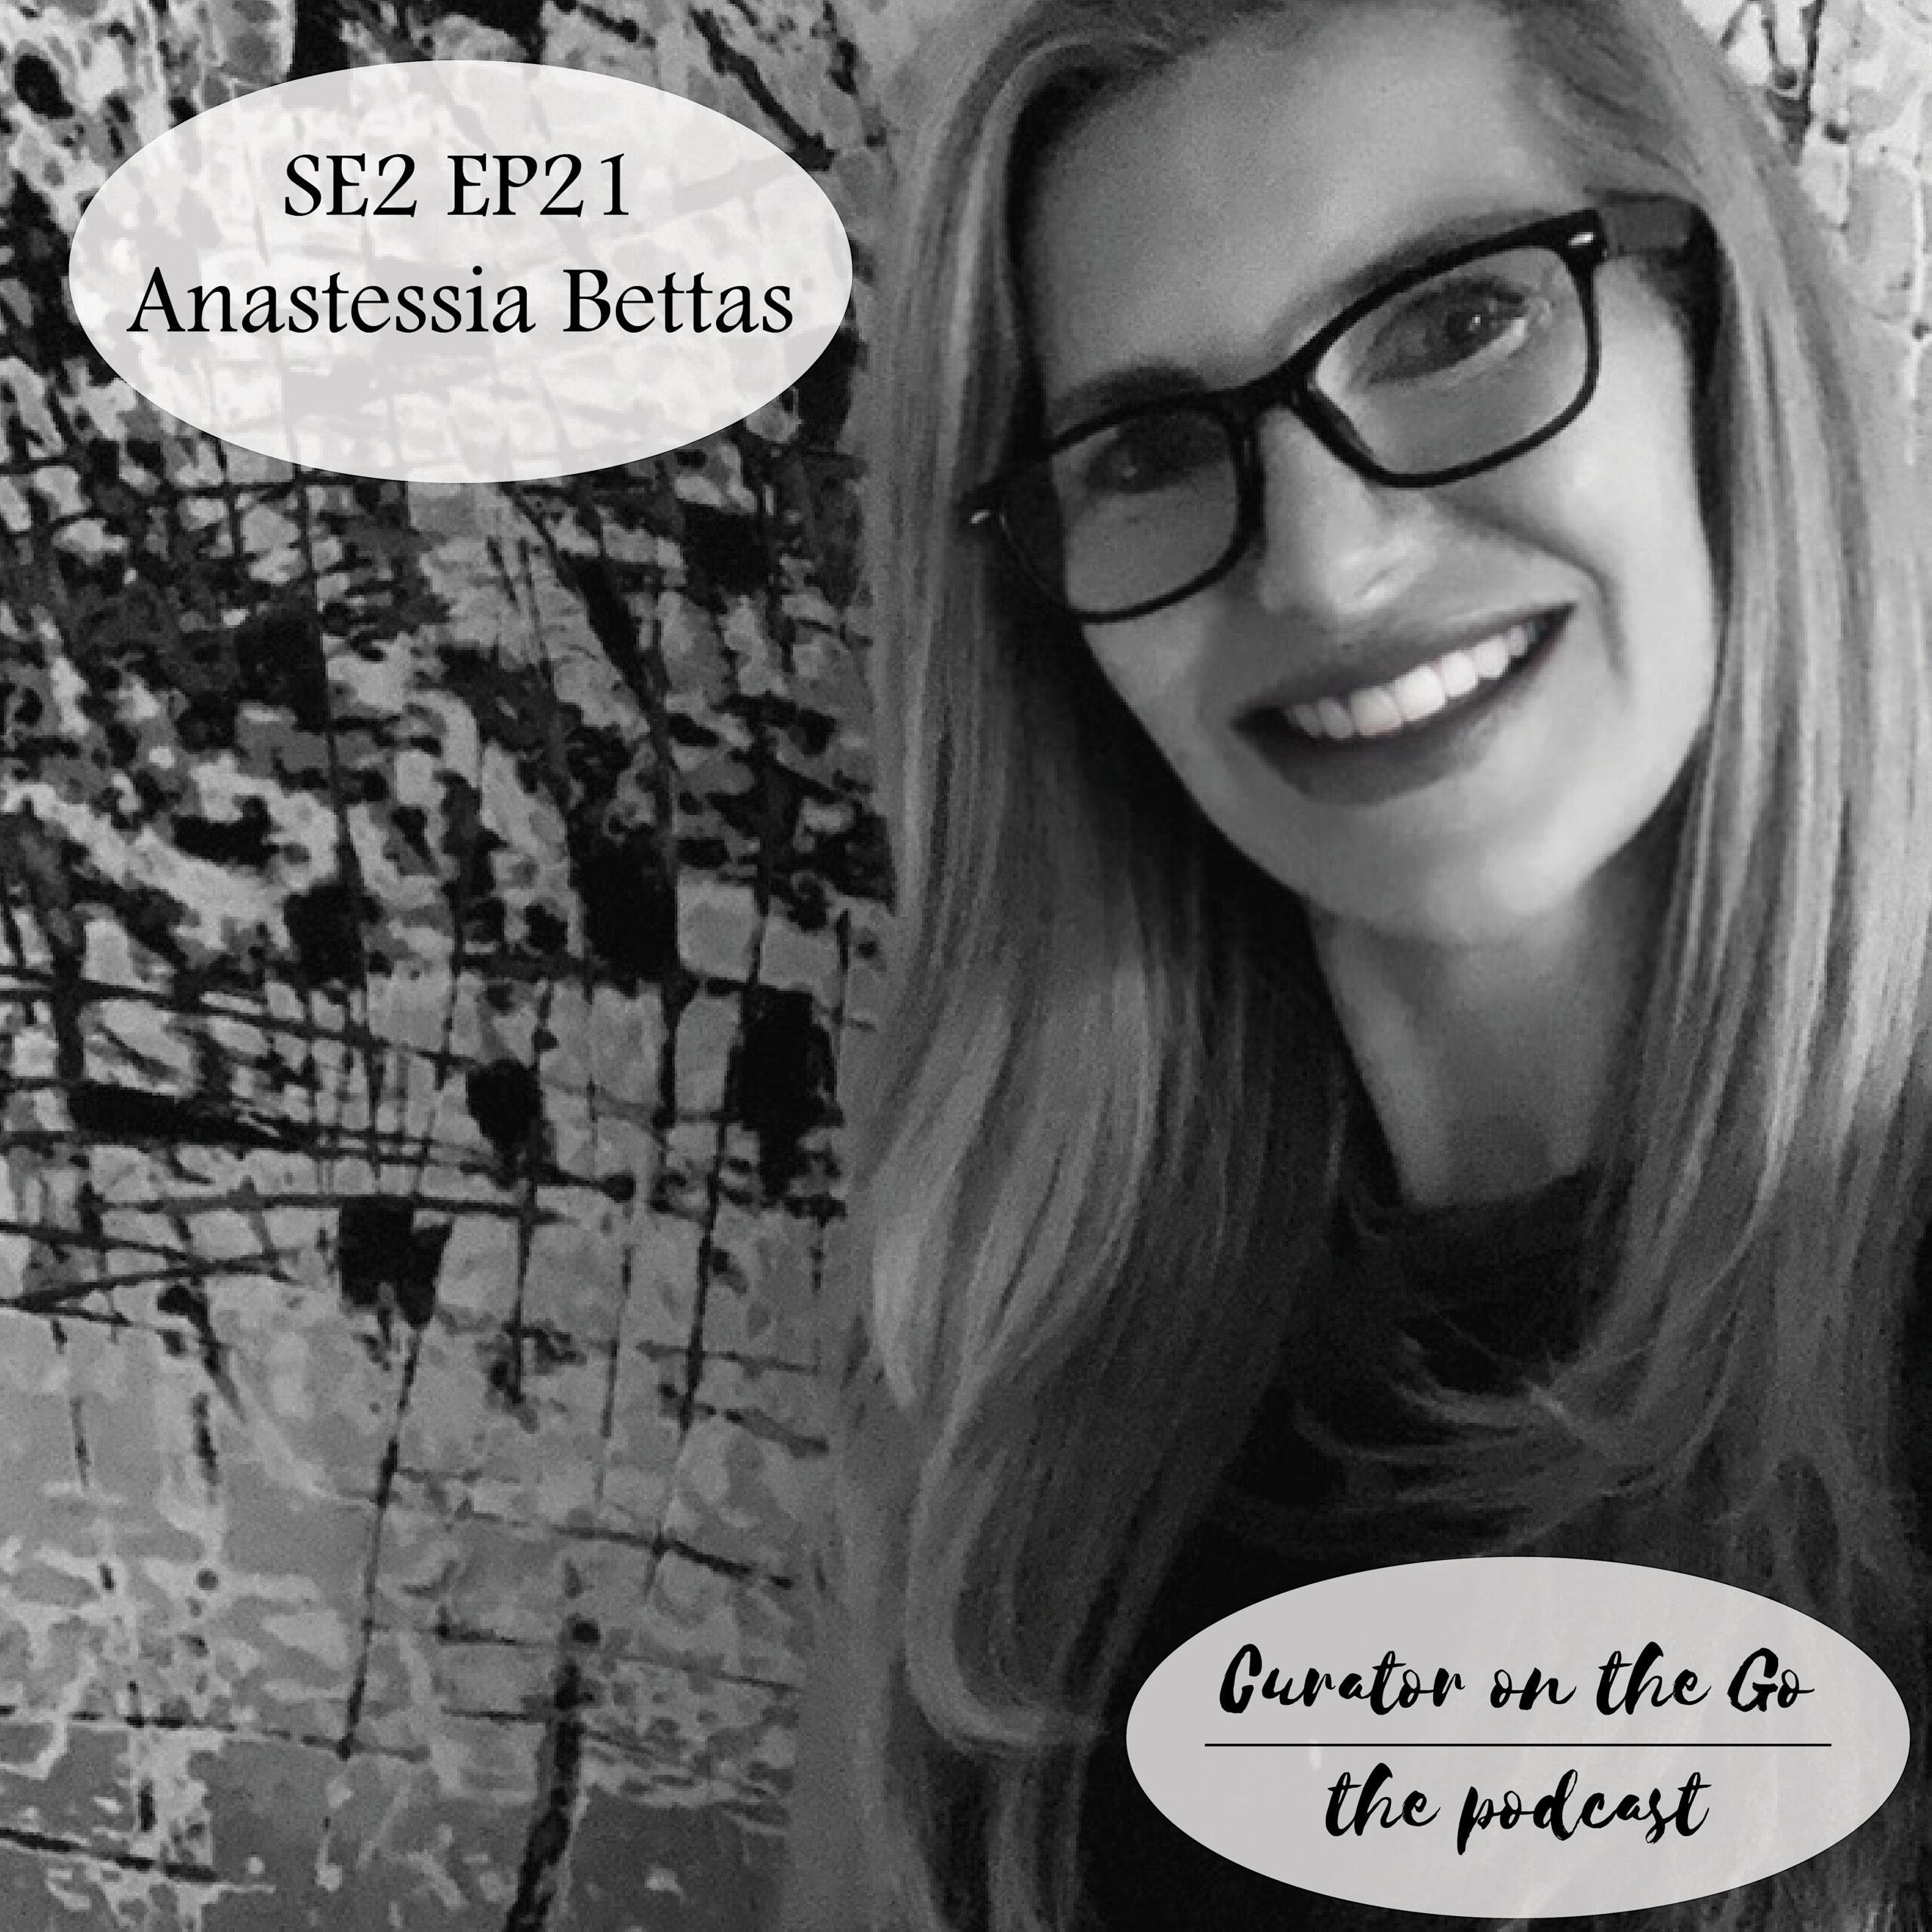 Anastessia Bettas